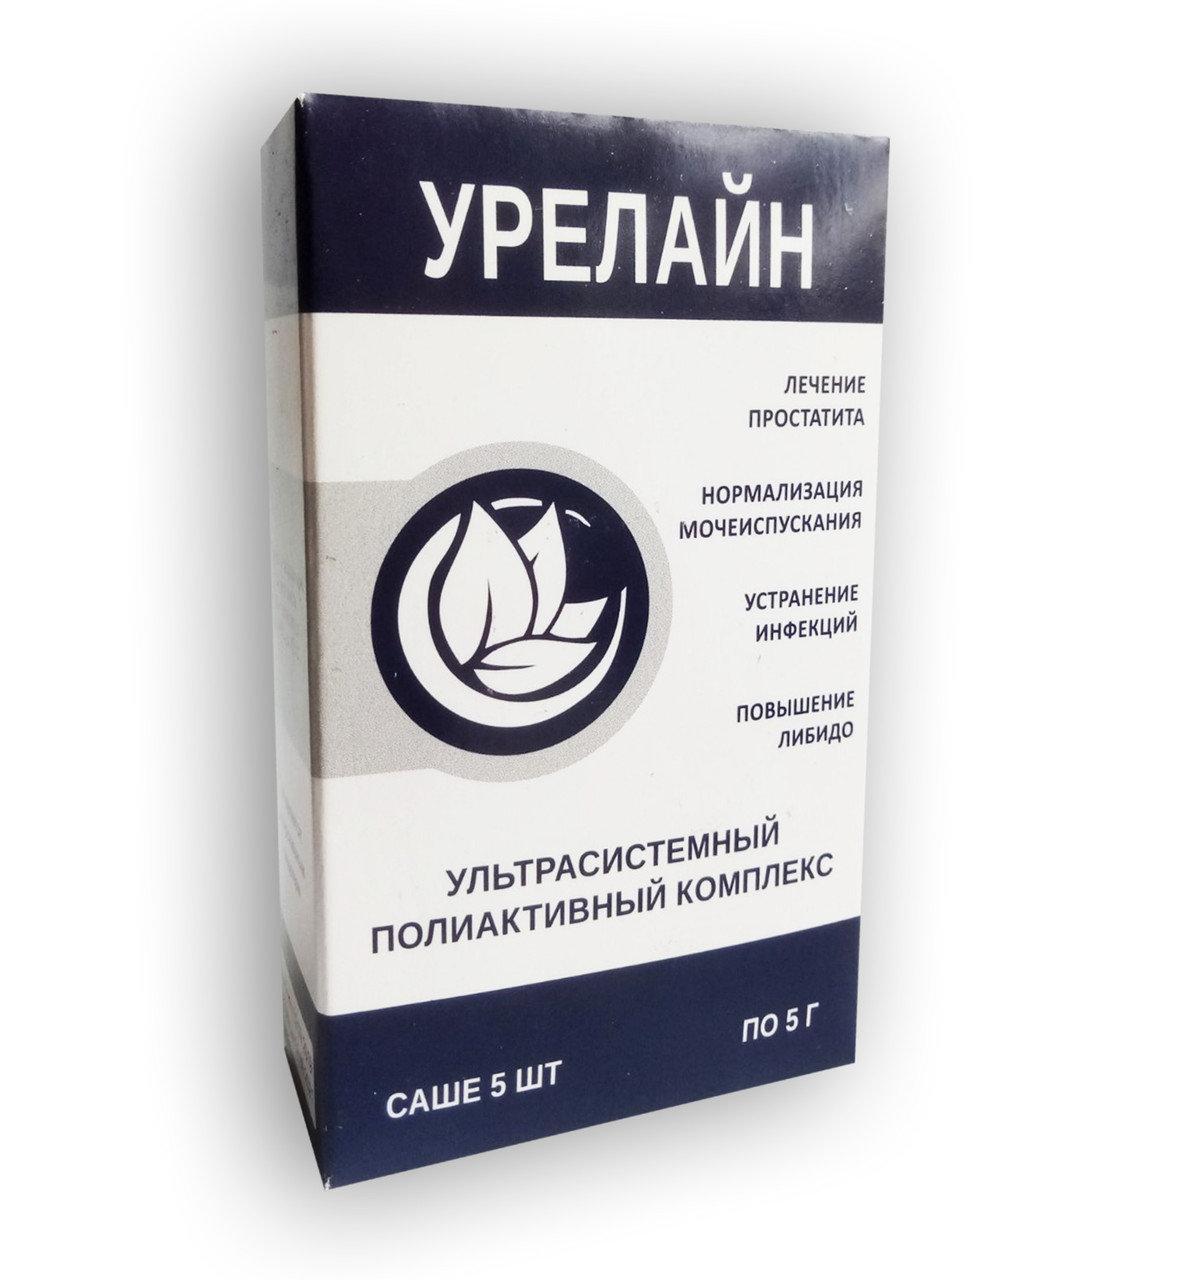 Урелайн - Средство от простатита ViP